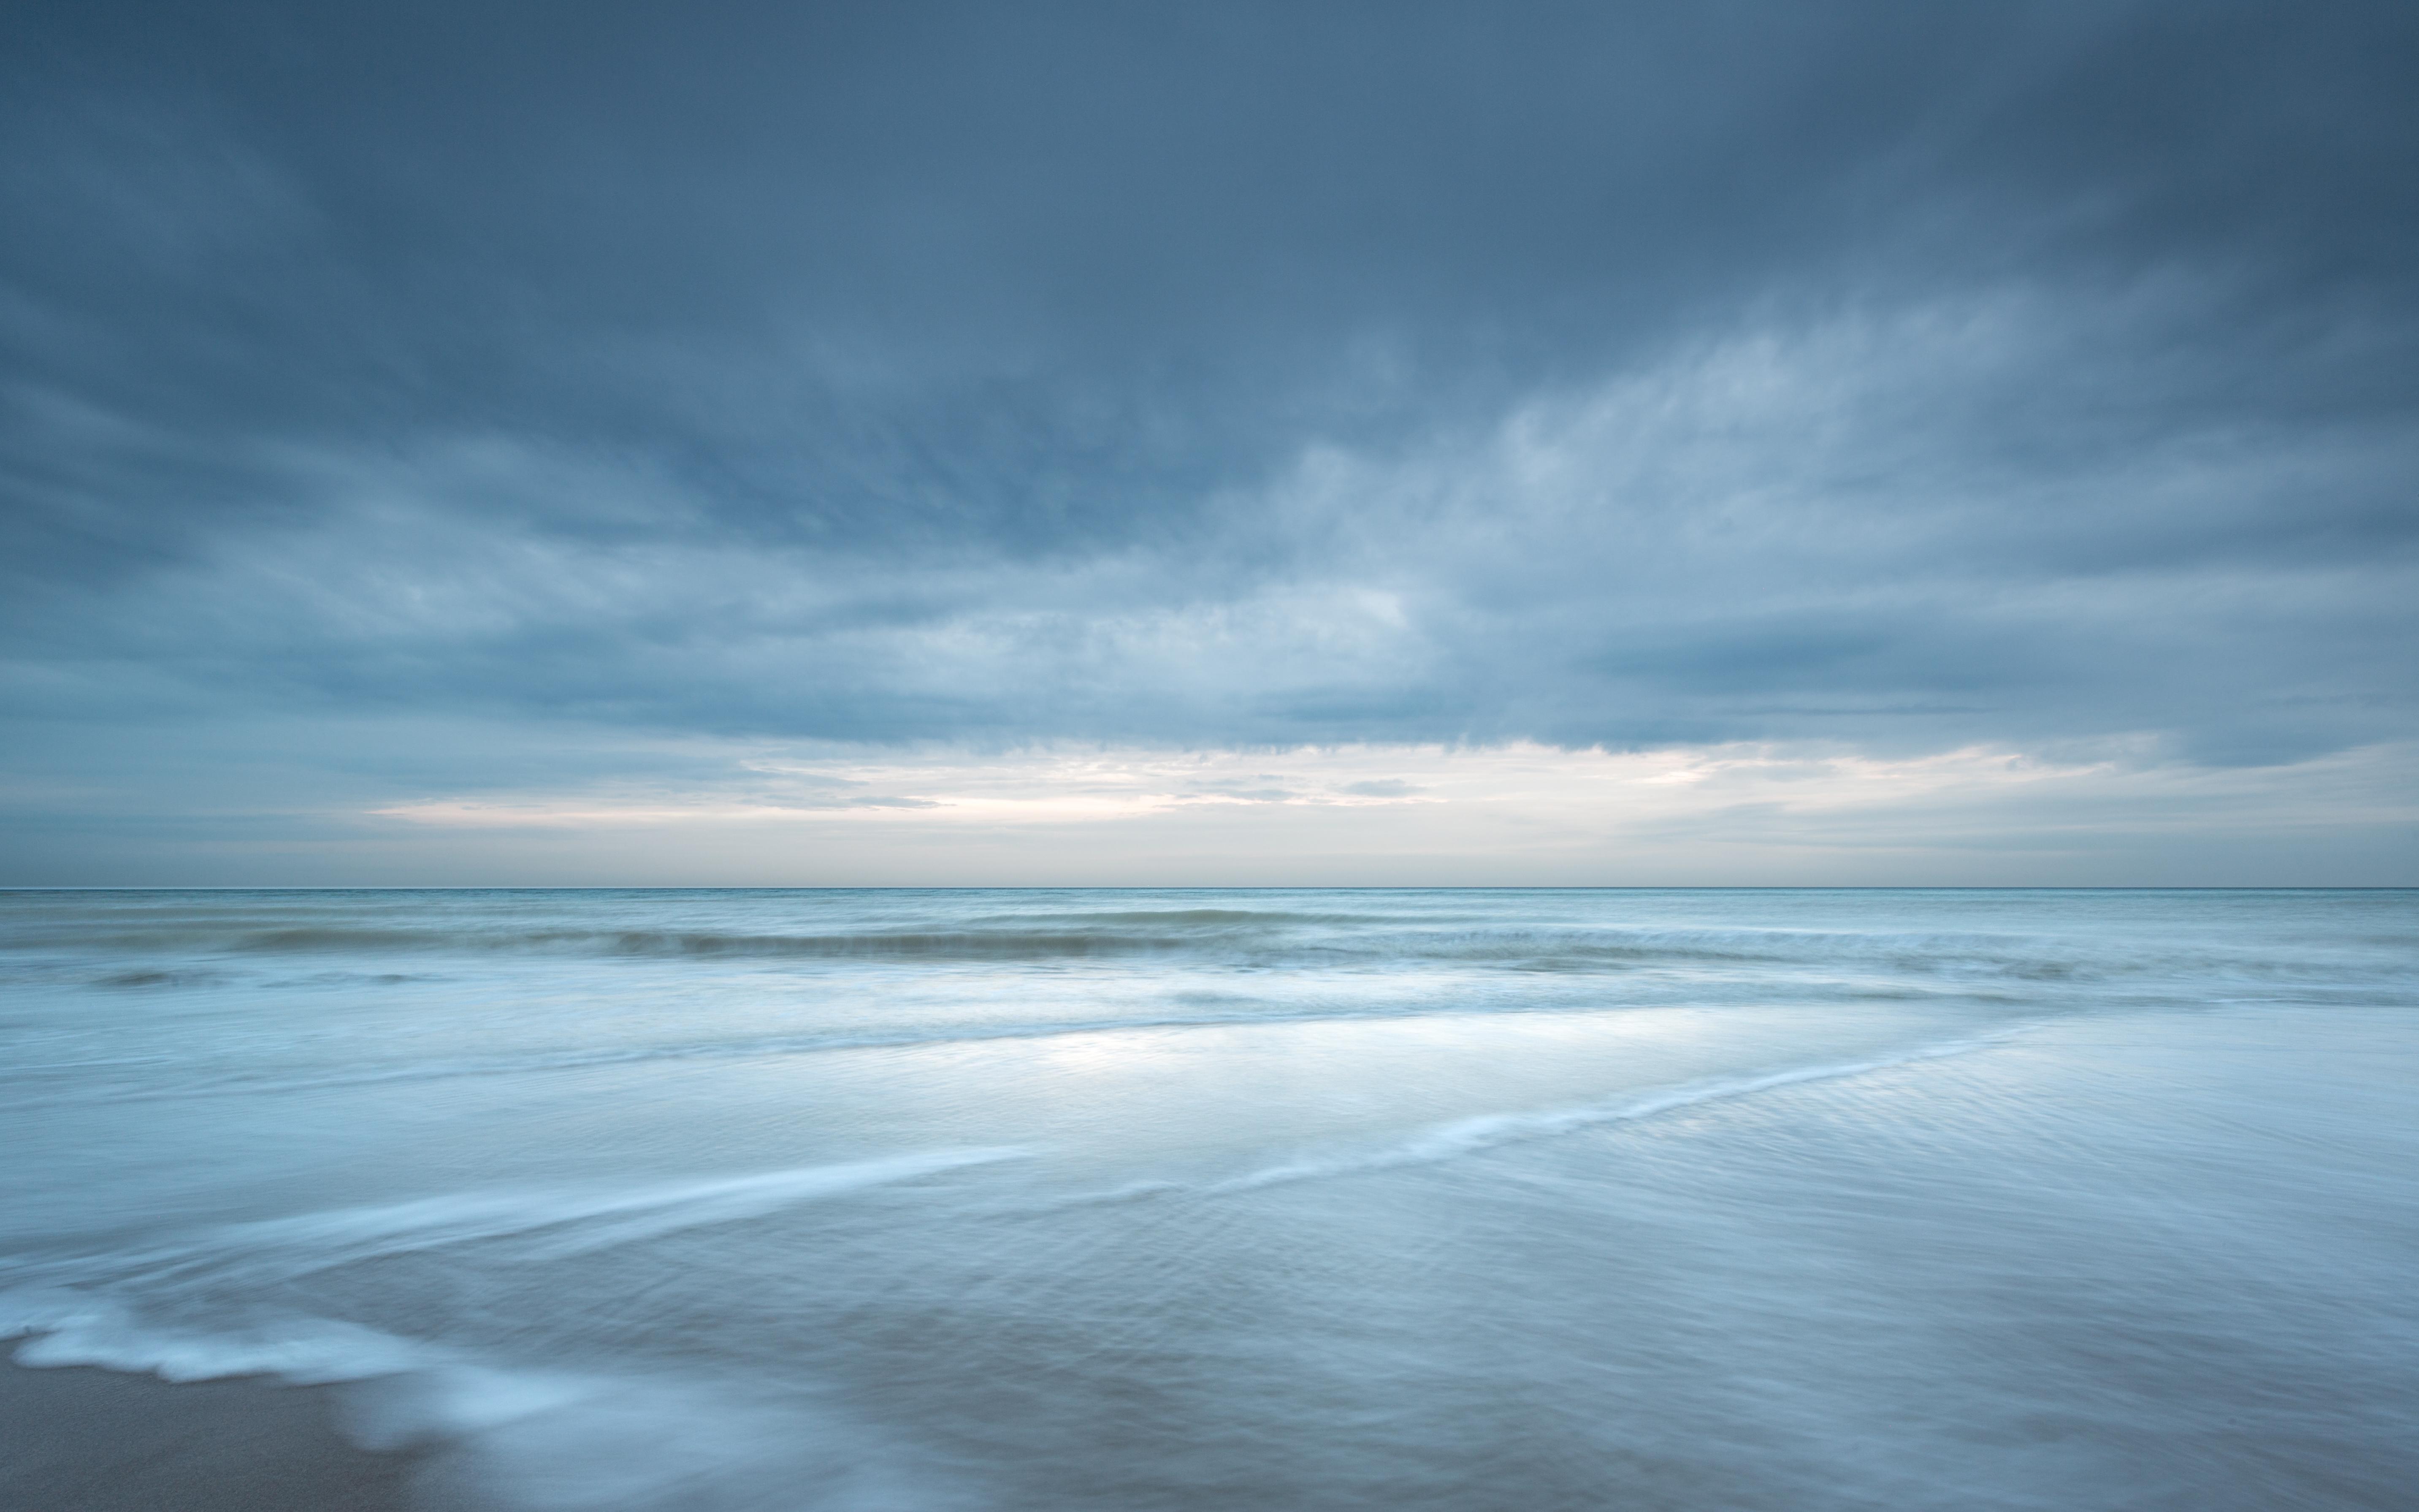 evening-shore